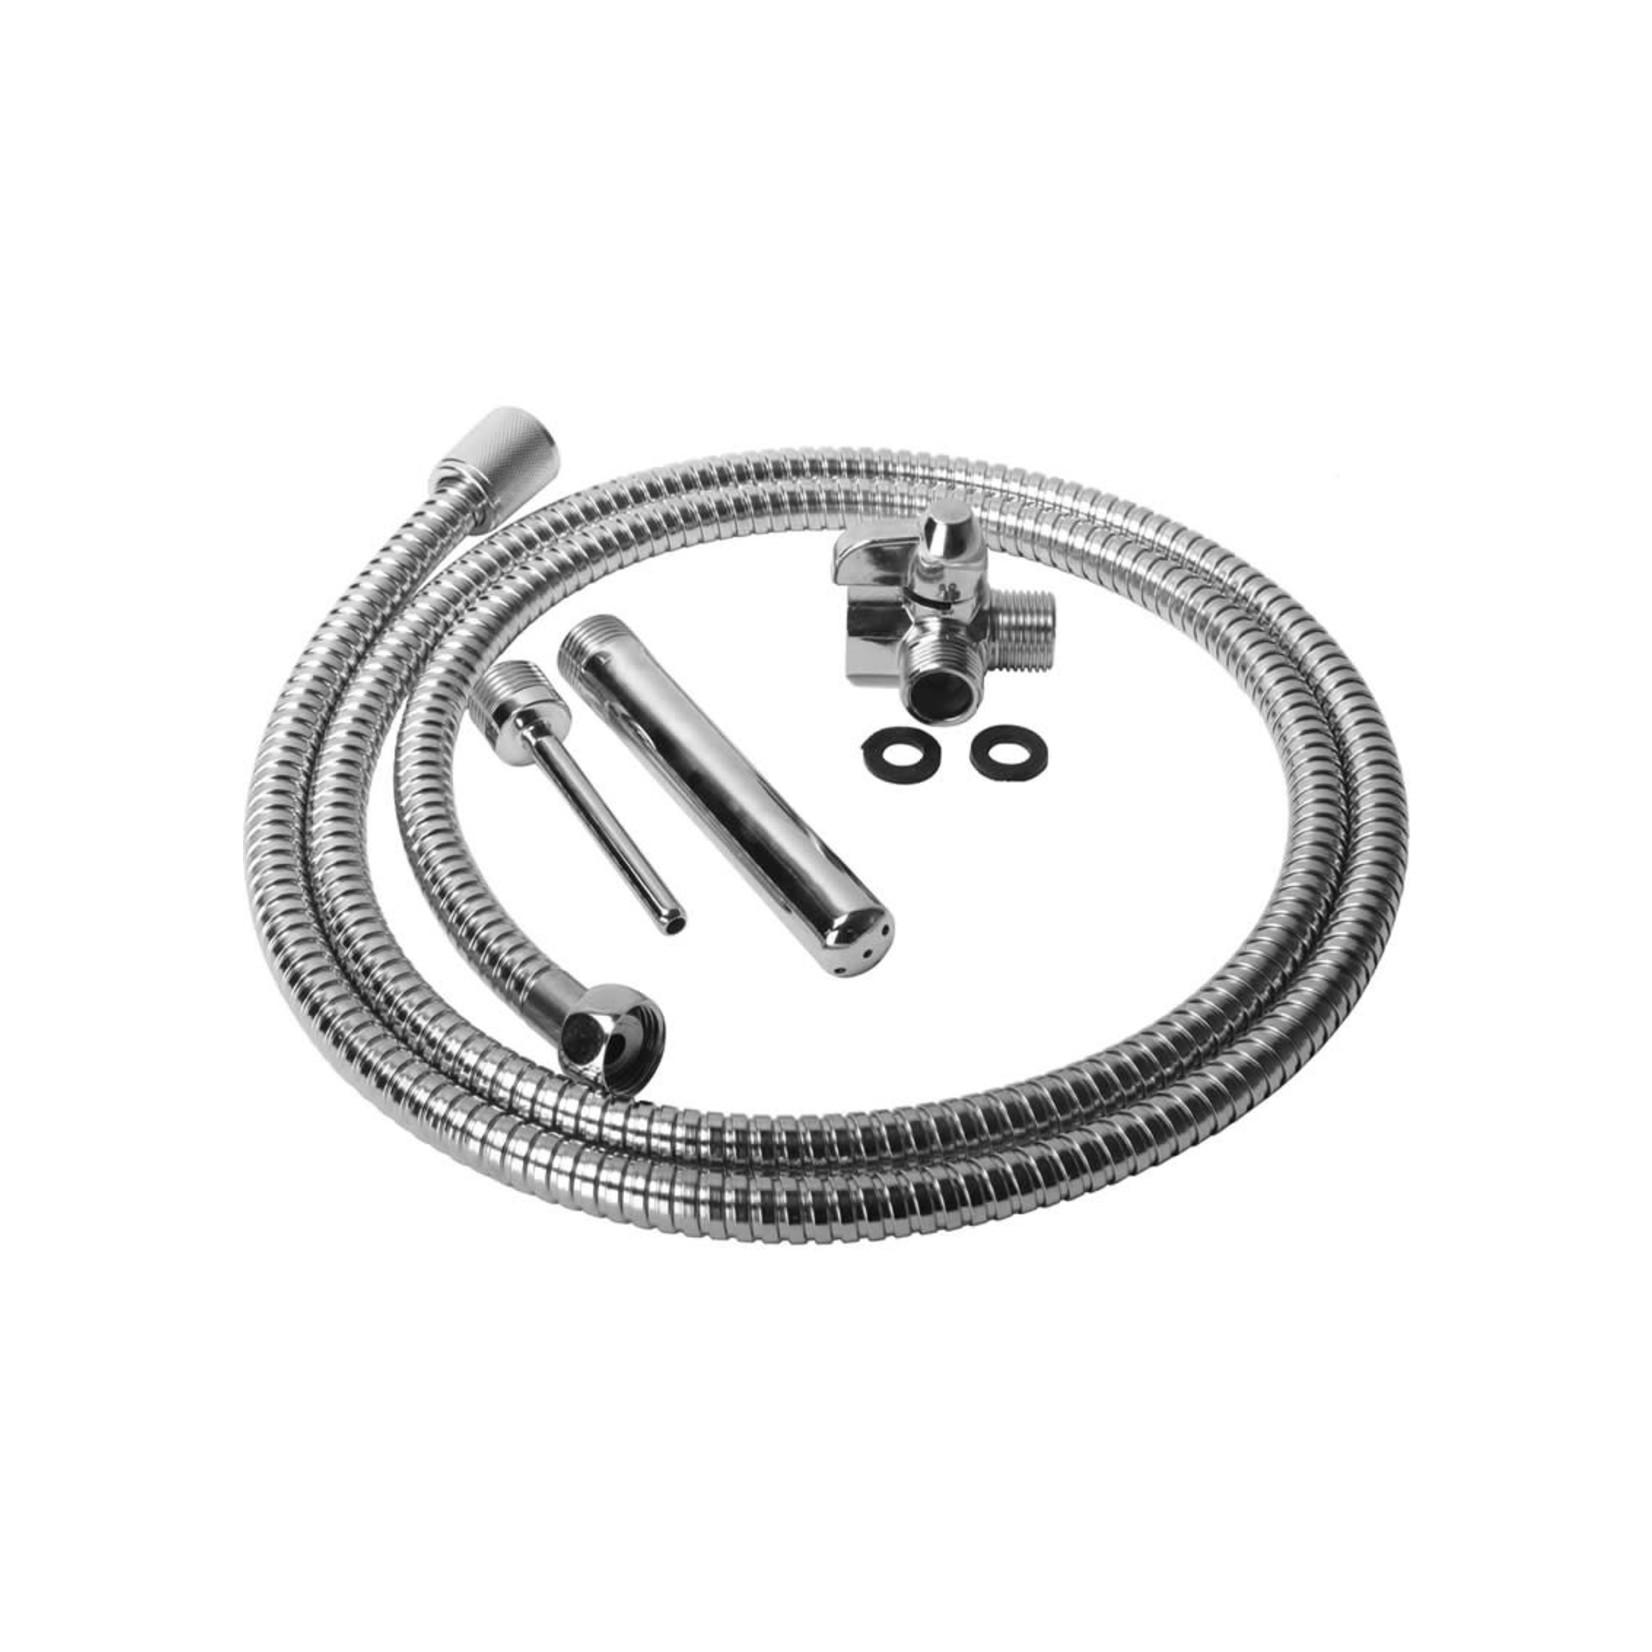 Cleanstream Shower Enema Set - Silver